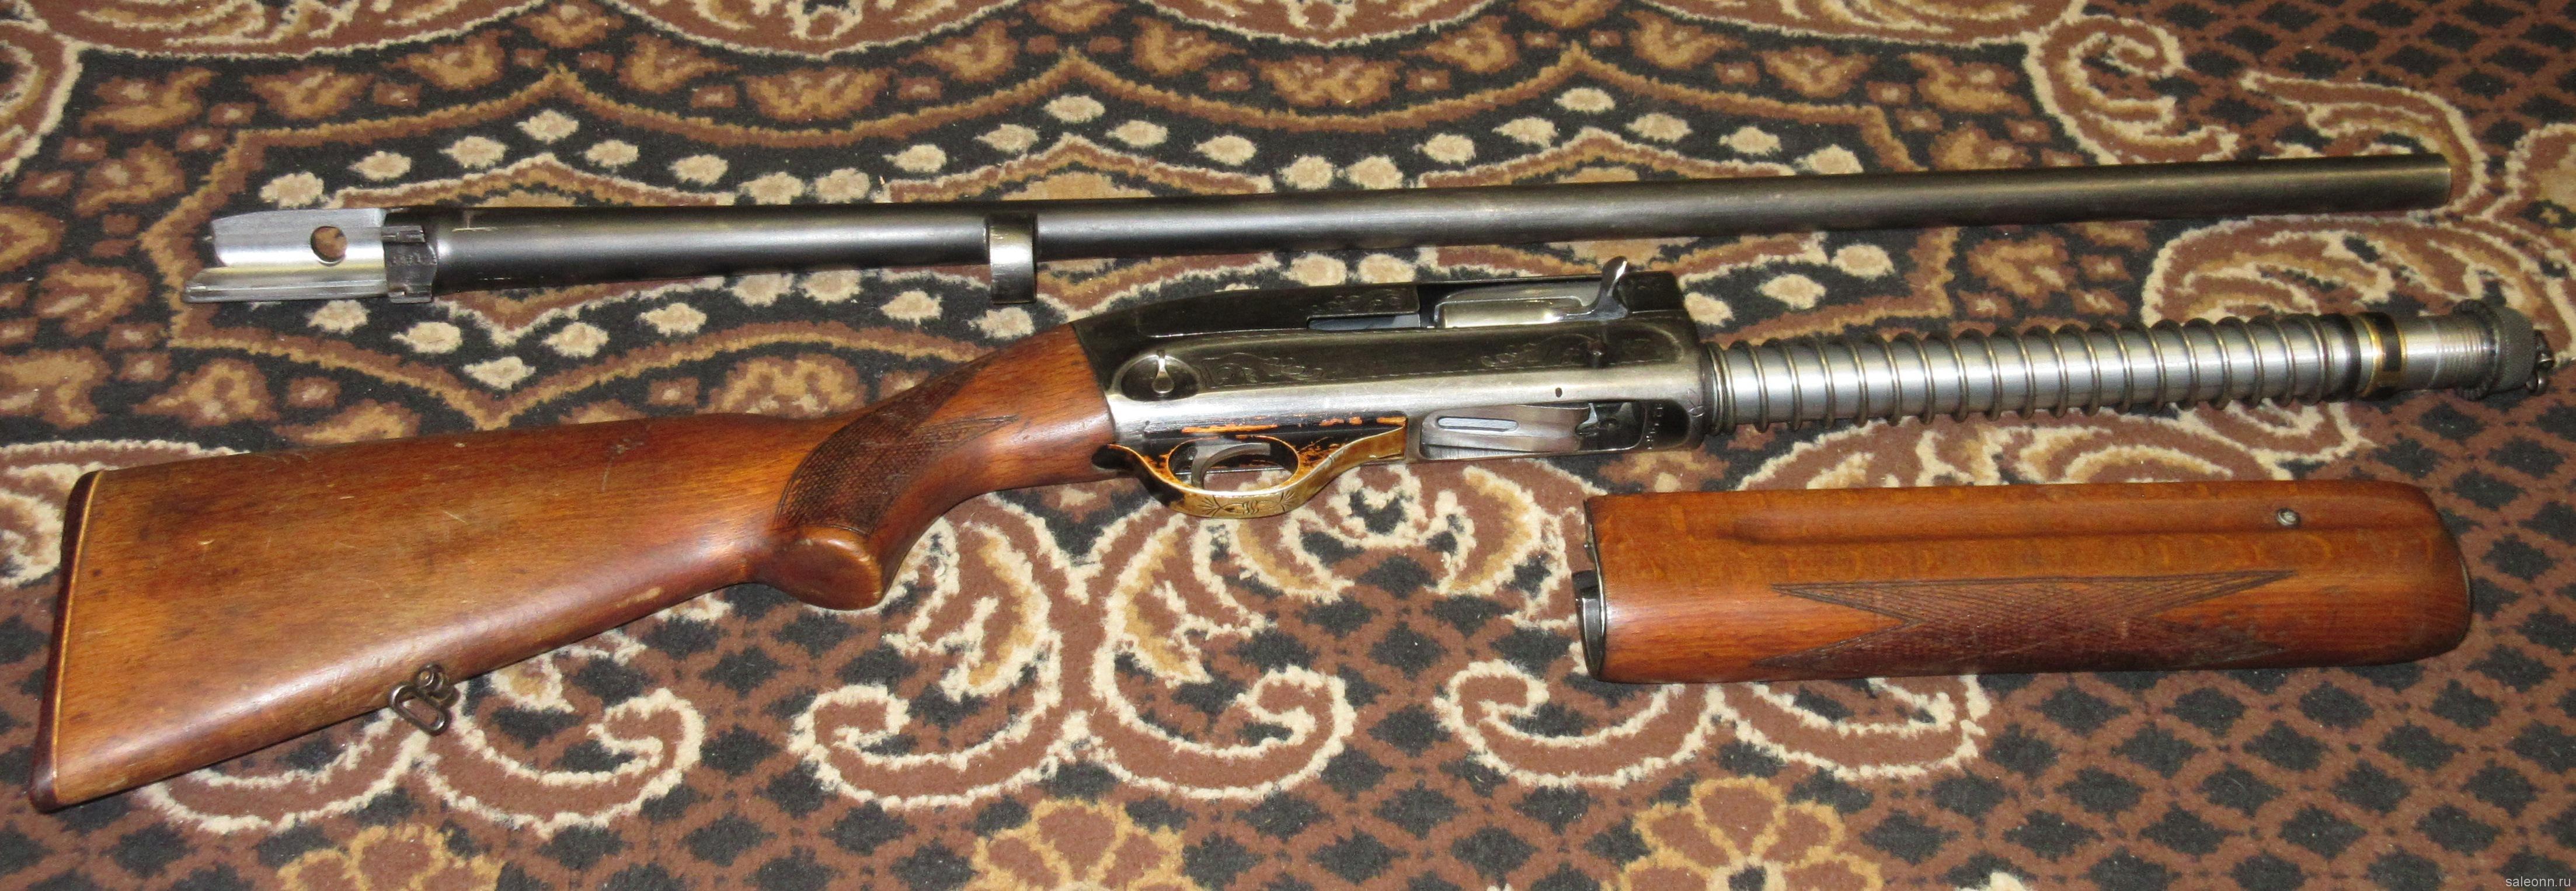 Разобранное ружье МЦ-21